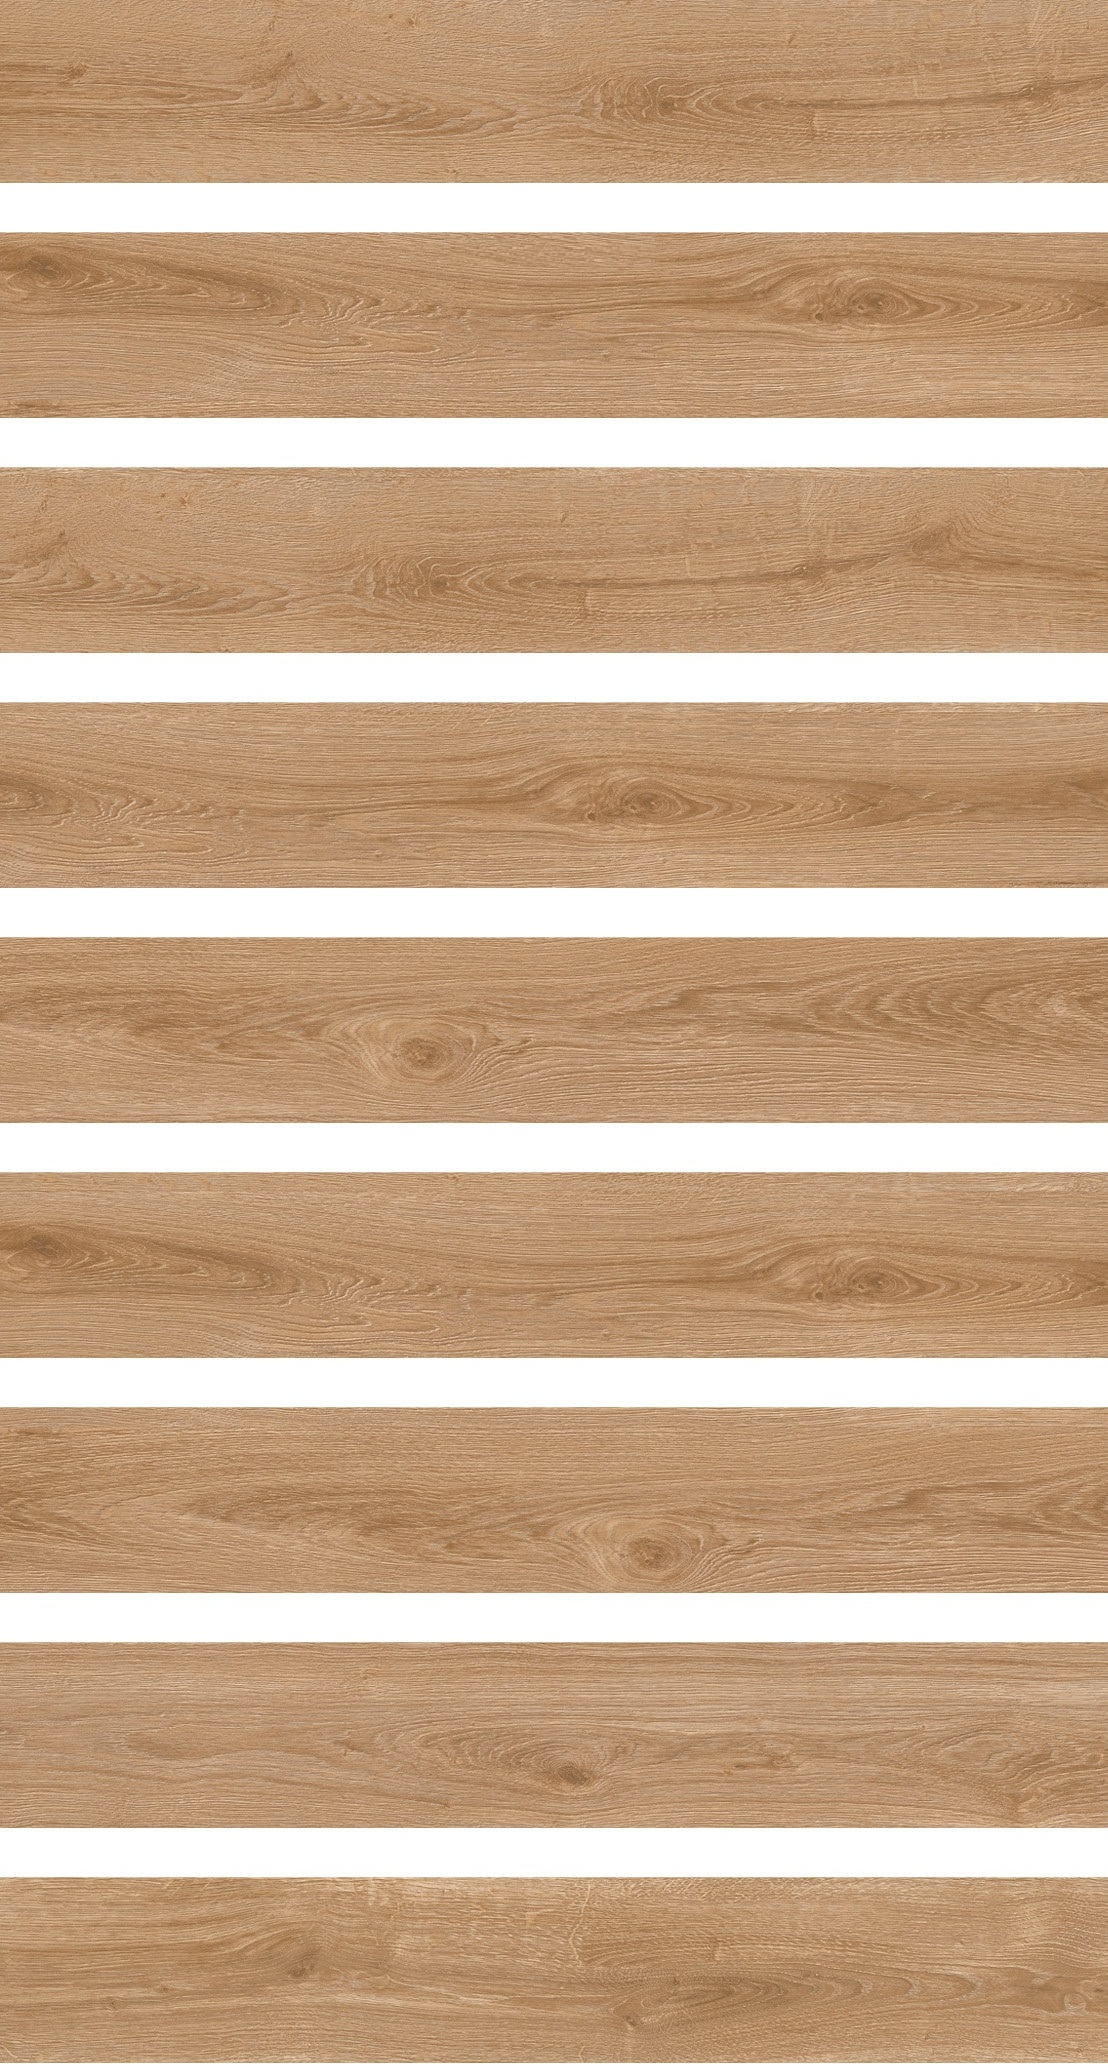 ceramic.md 15x90 wood beige